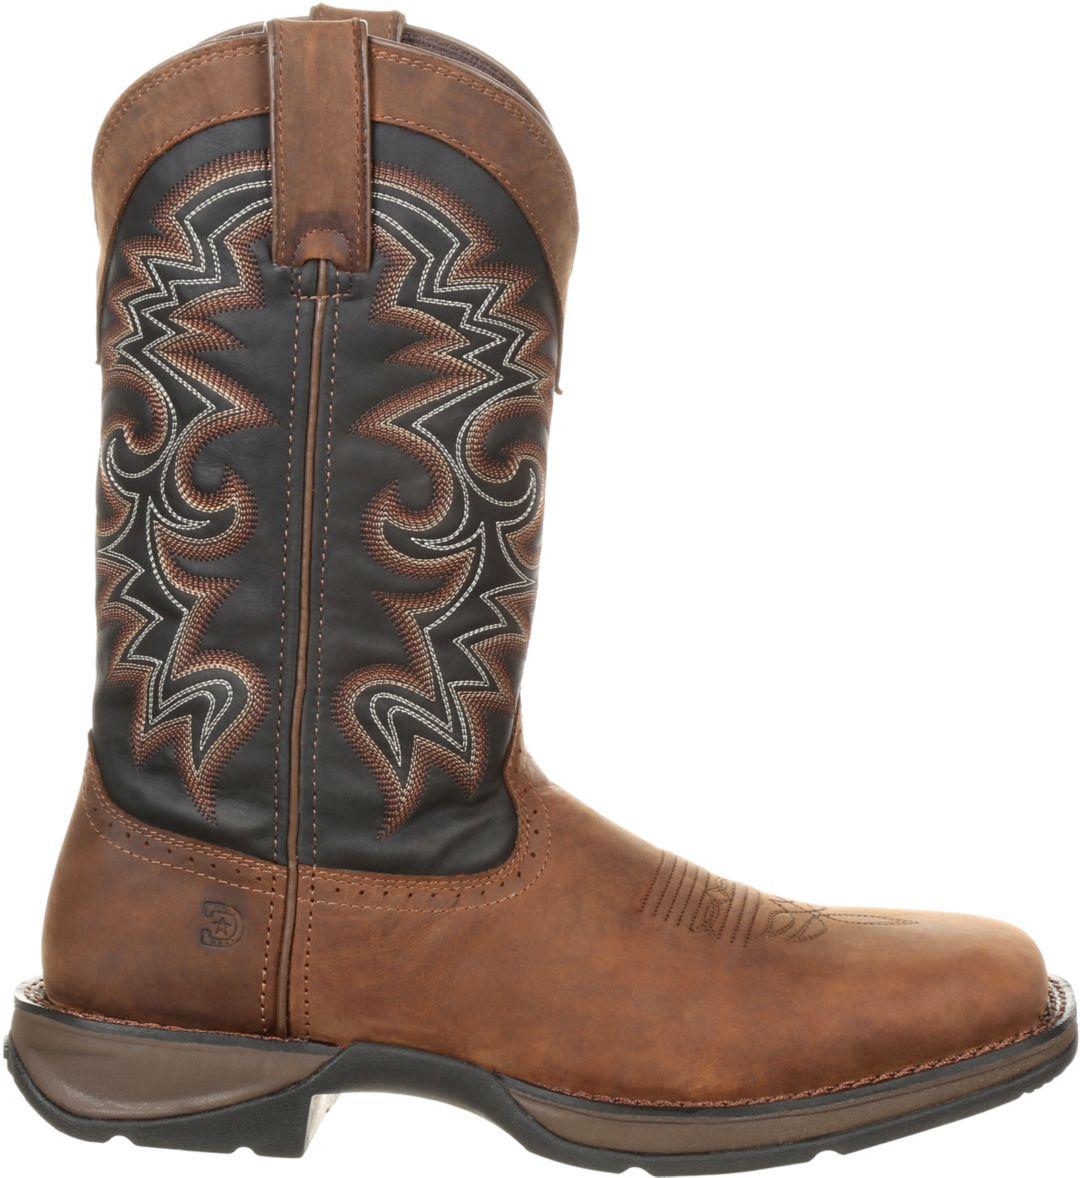 1731f3b8dec Durango Men's Rebel Pull-On Western Boots